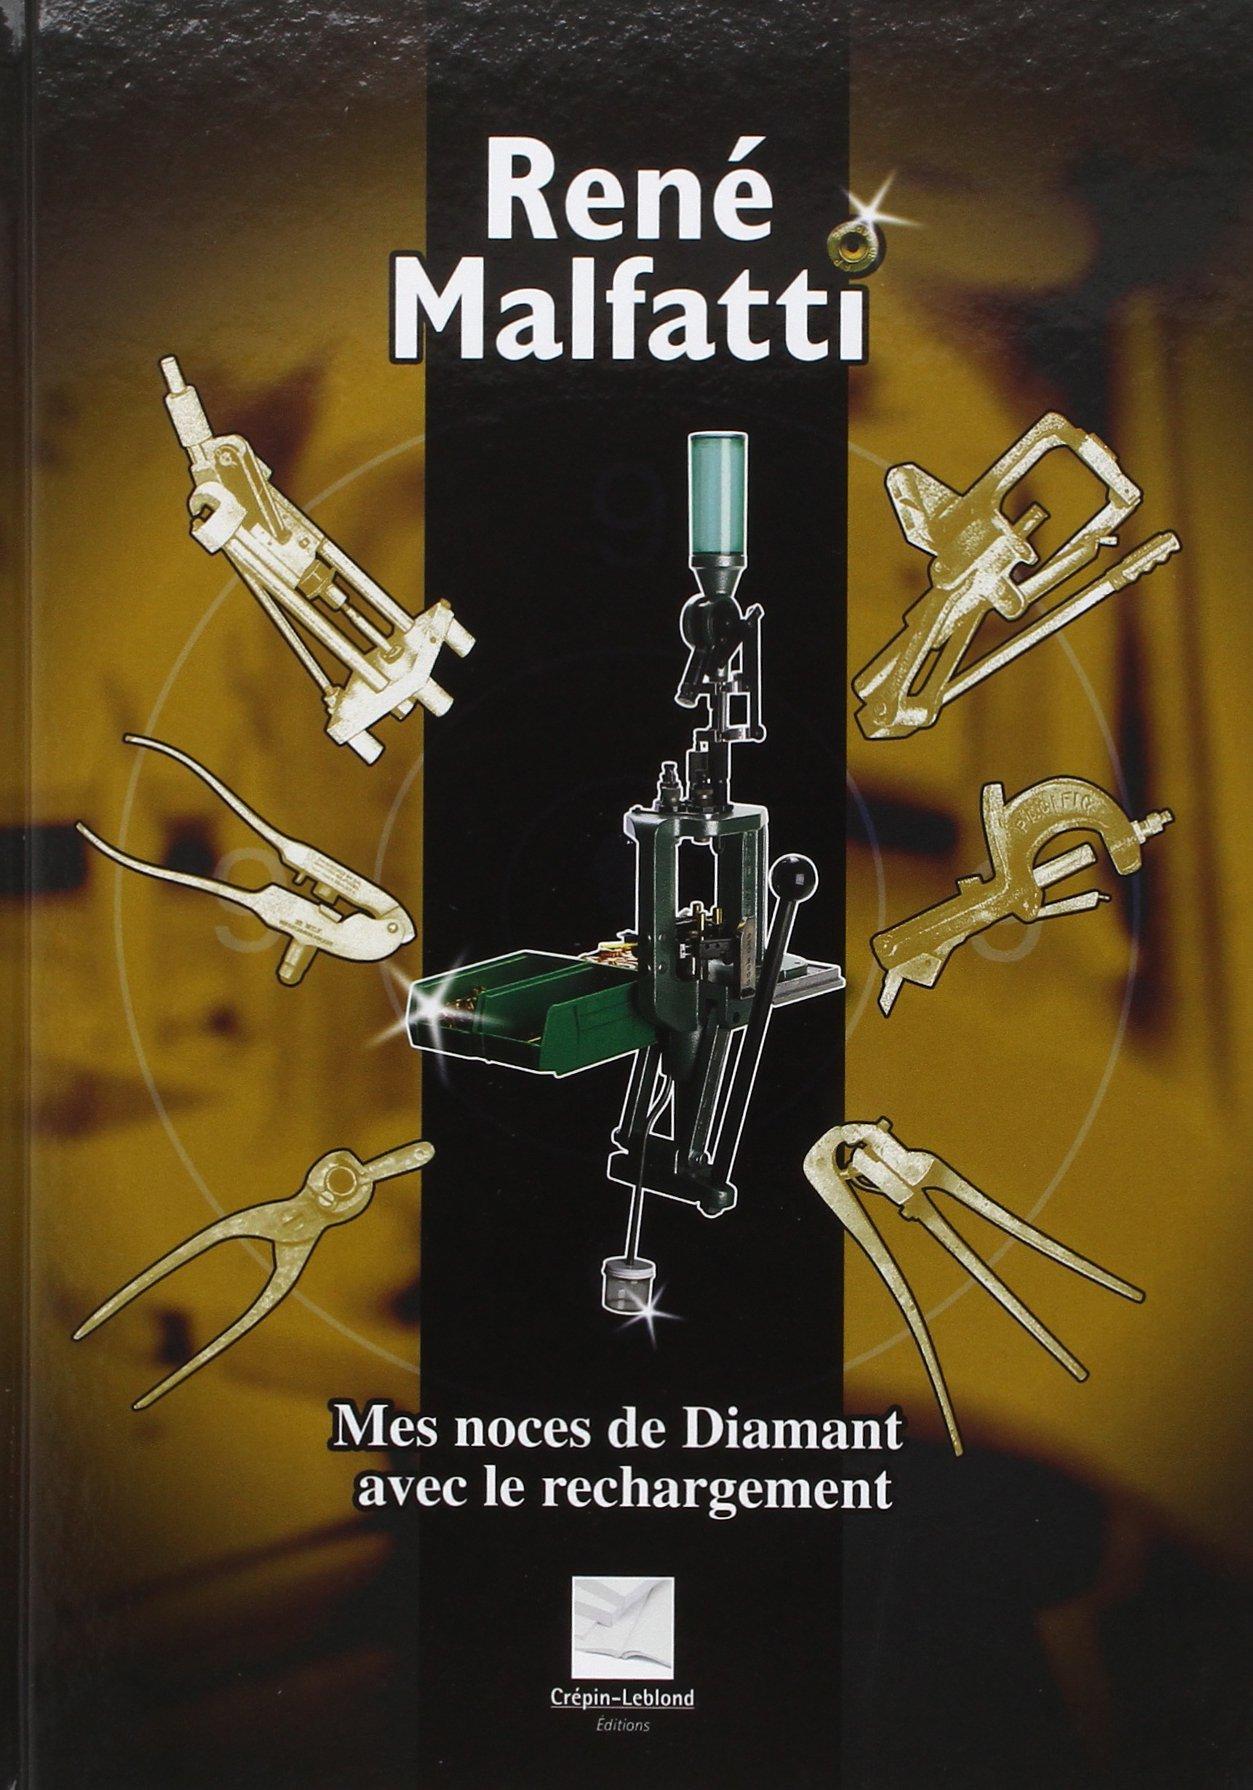 MALFATTI RECHARGEMENT TÉLÉCHARGER